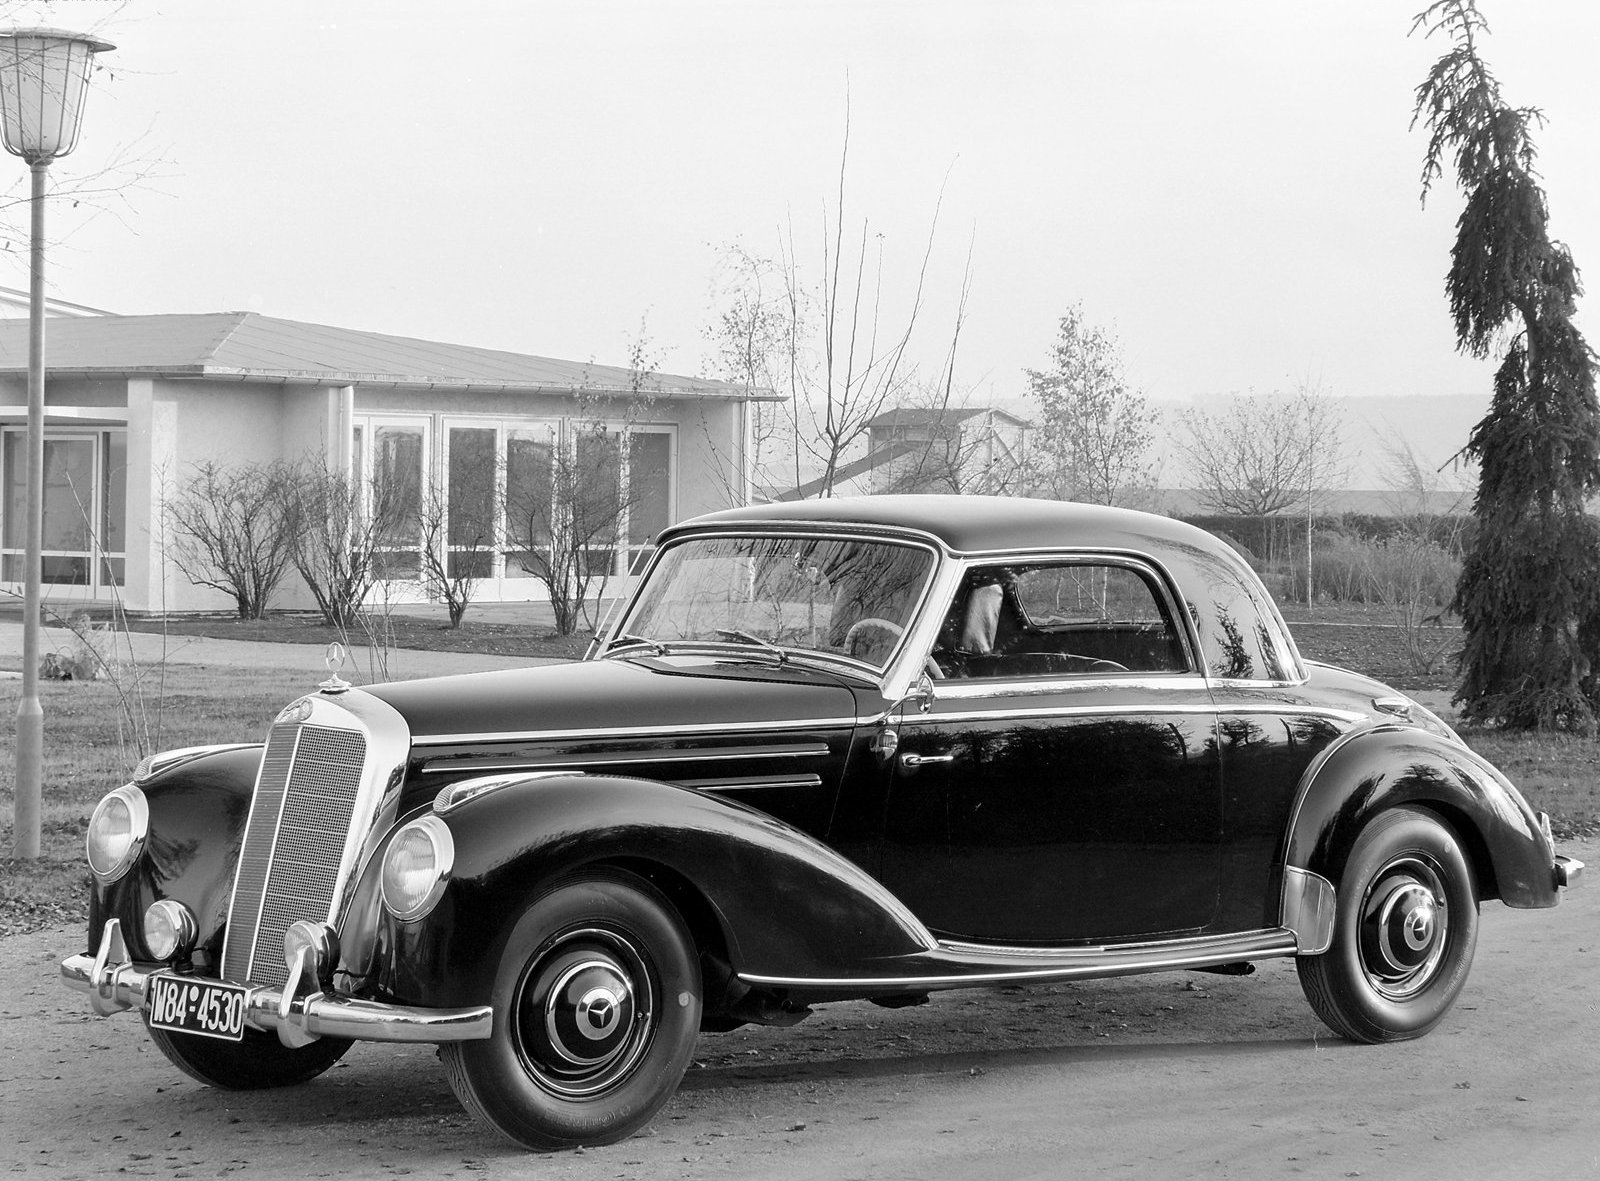 Los coches antiguos de mercedes benz del a o 1955 al 1931 for Mercedes benz delaware